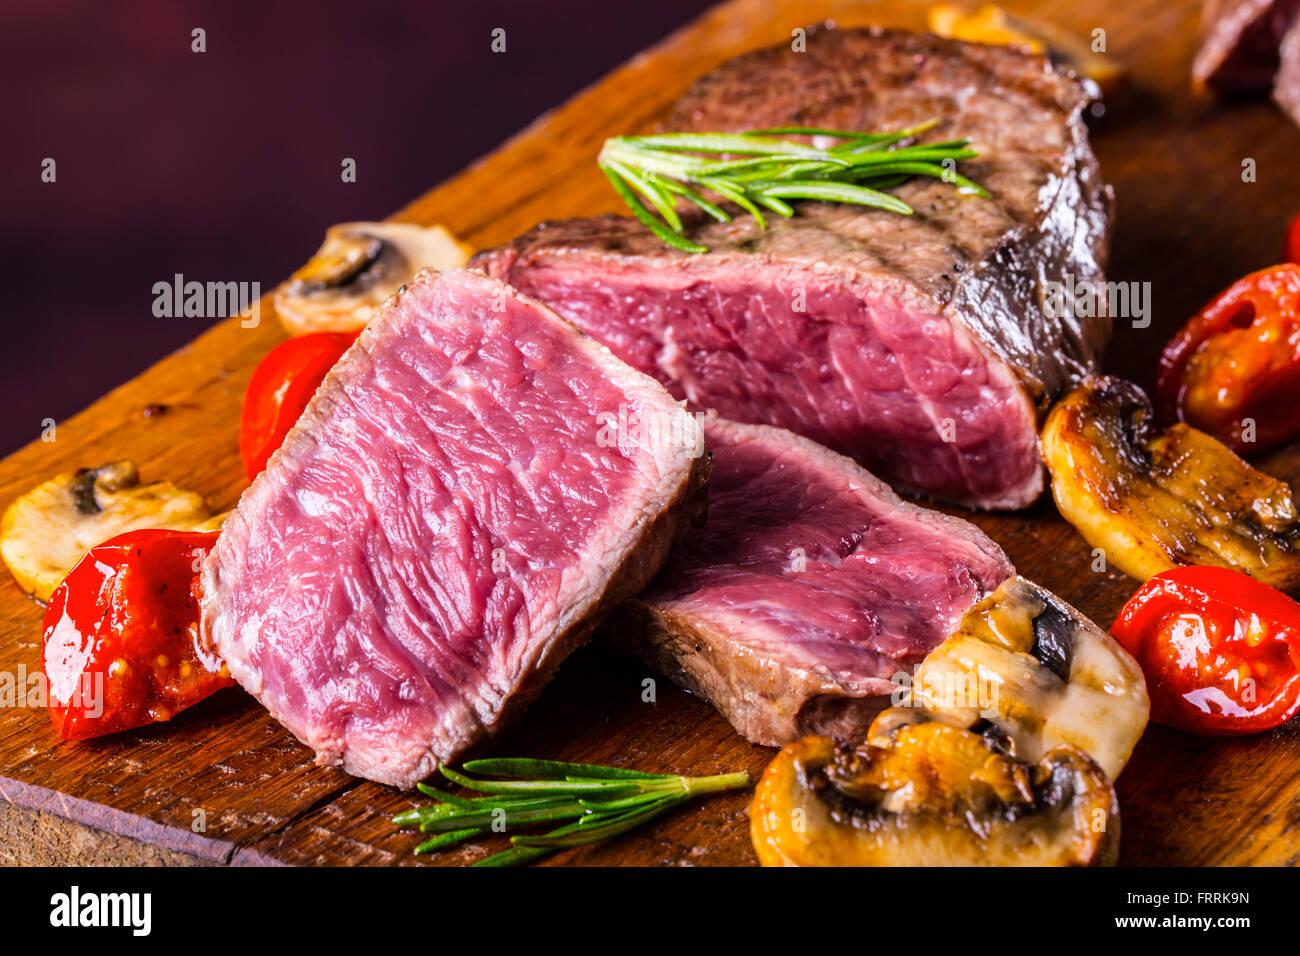 beef steaks stockfotos beef steaks bilder alamy. Black Bedroom Furniture Sets. Home Design Ideas